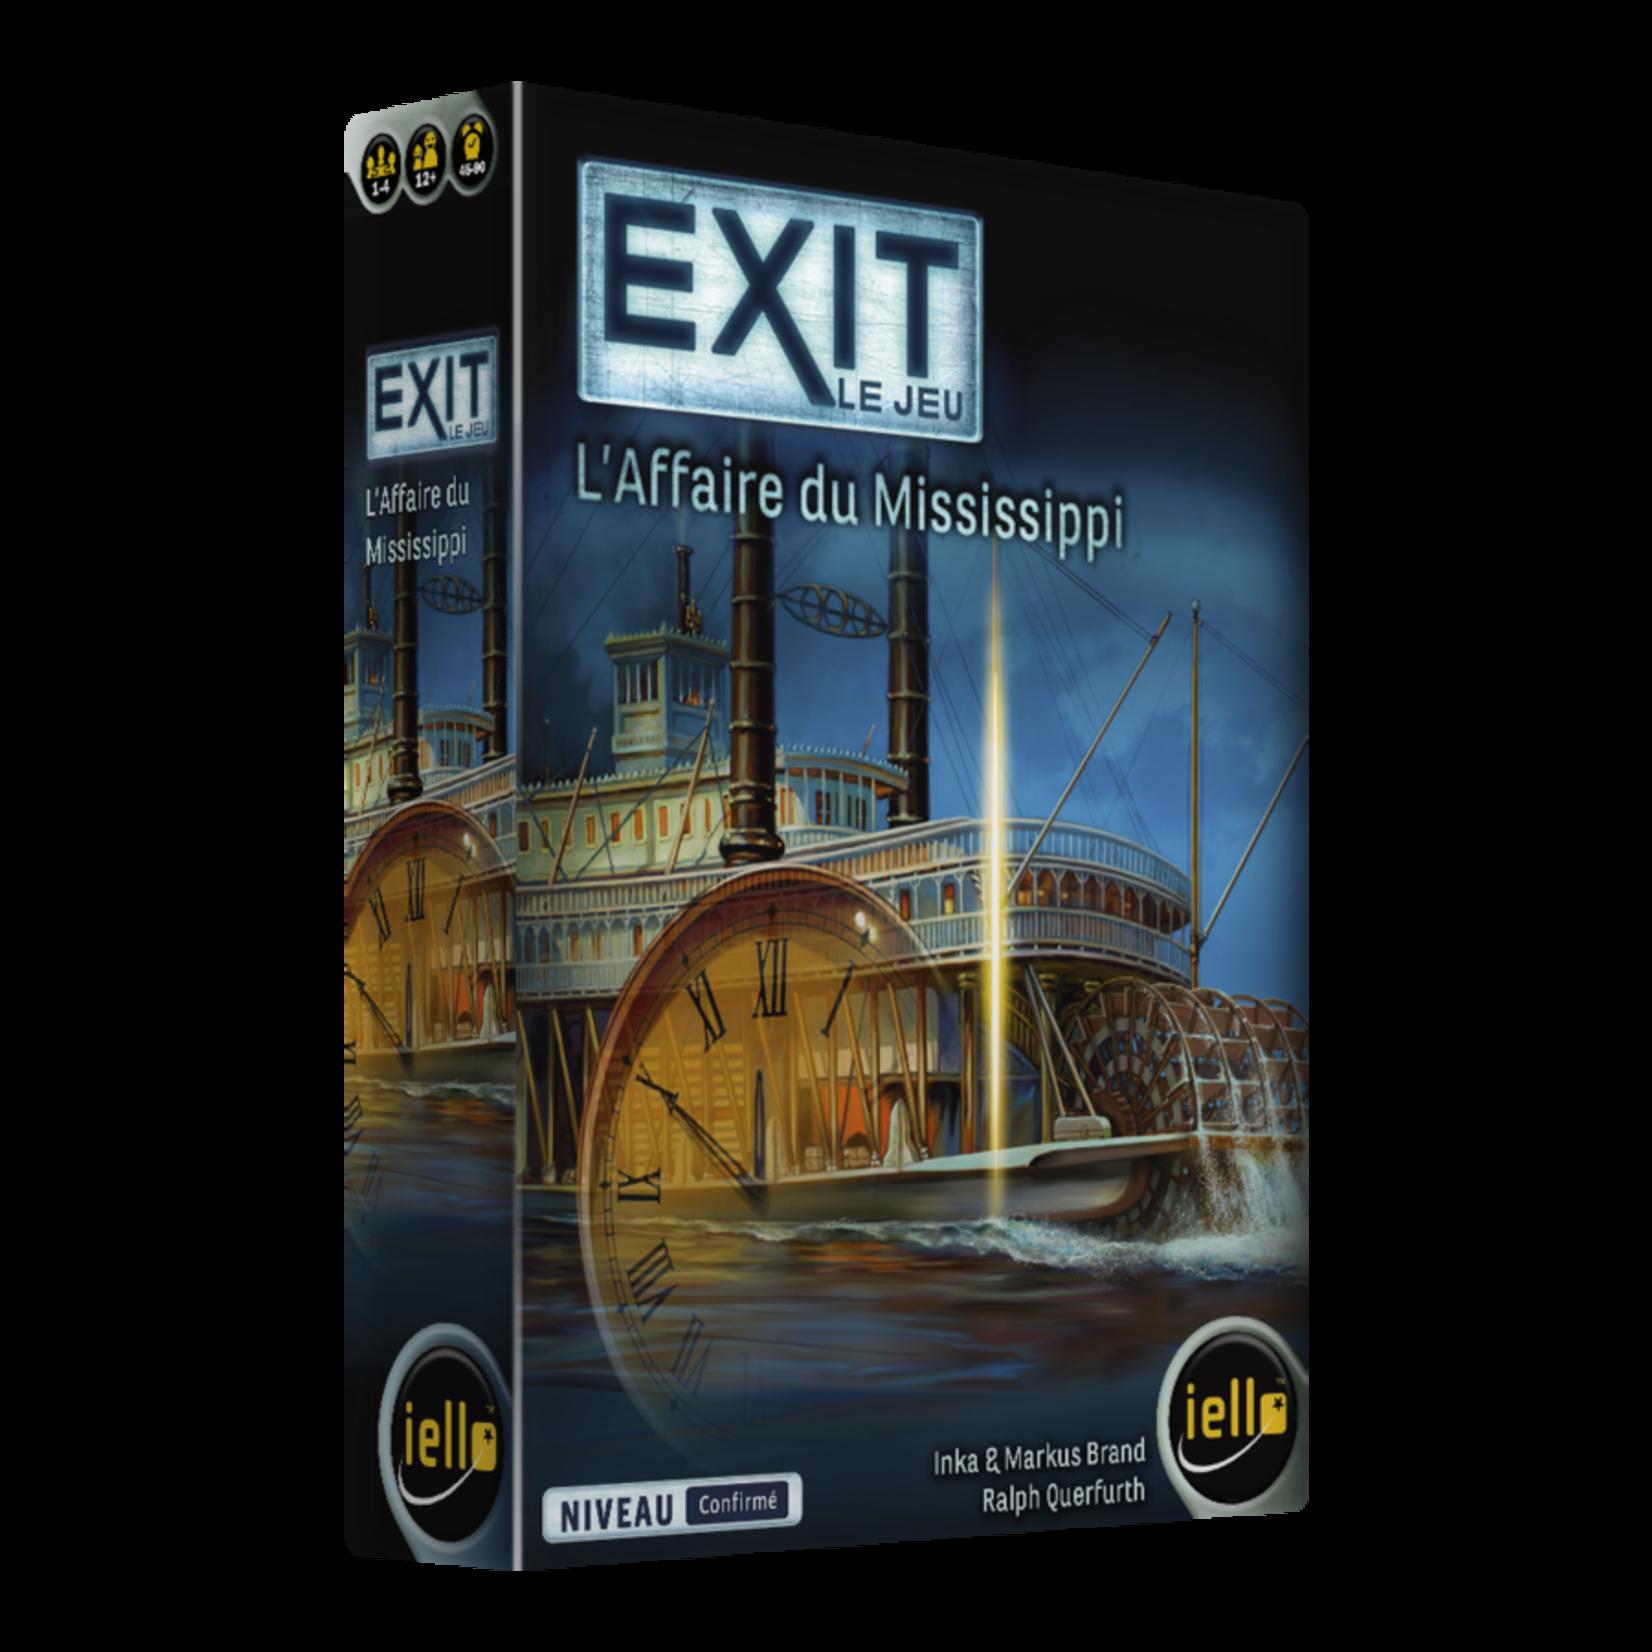 Iello Exit - L'Affaire du Mississipi (French)